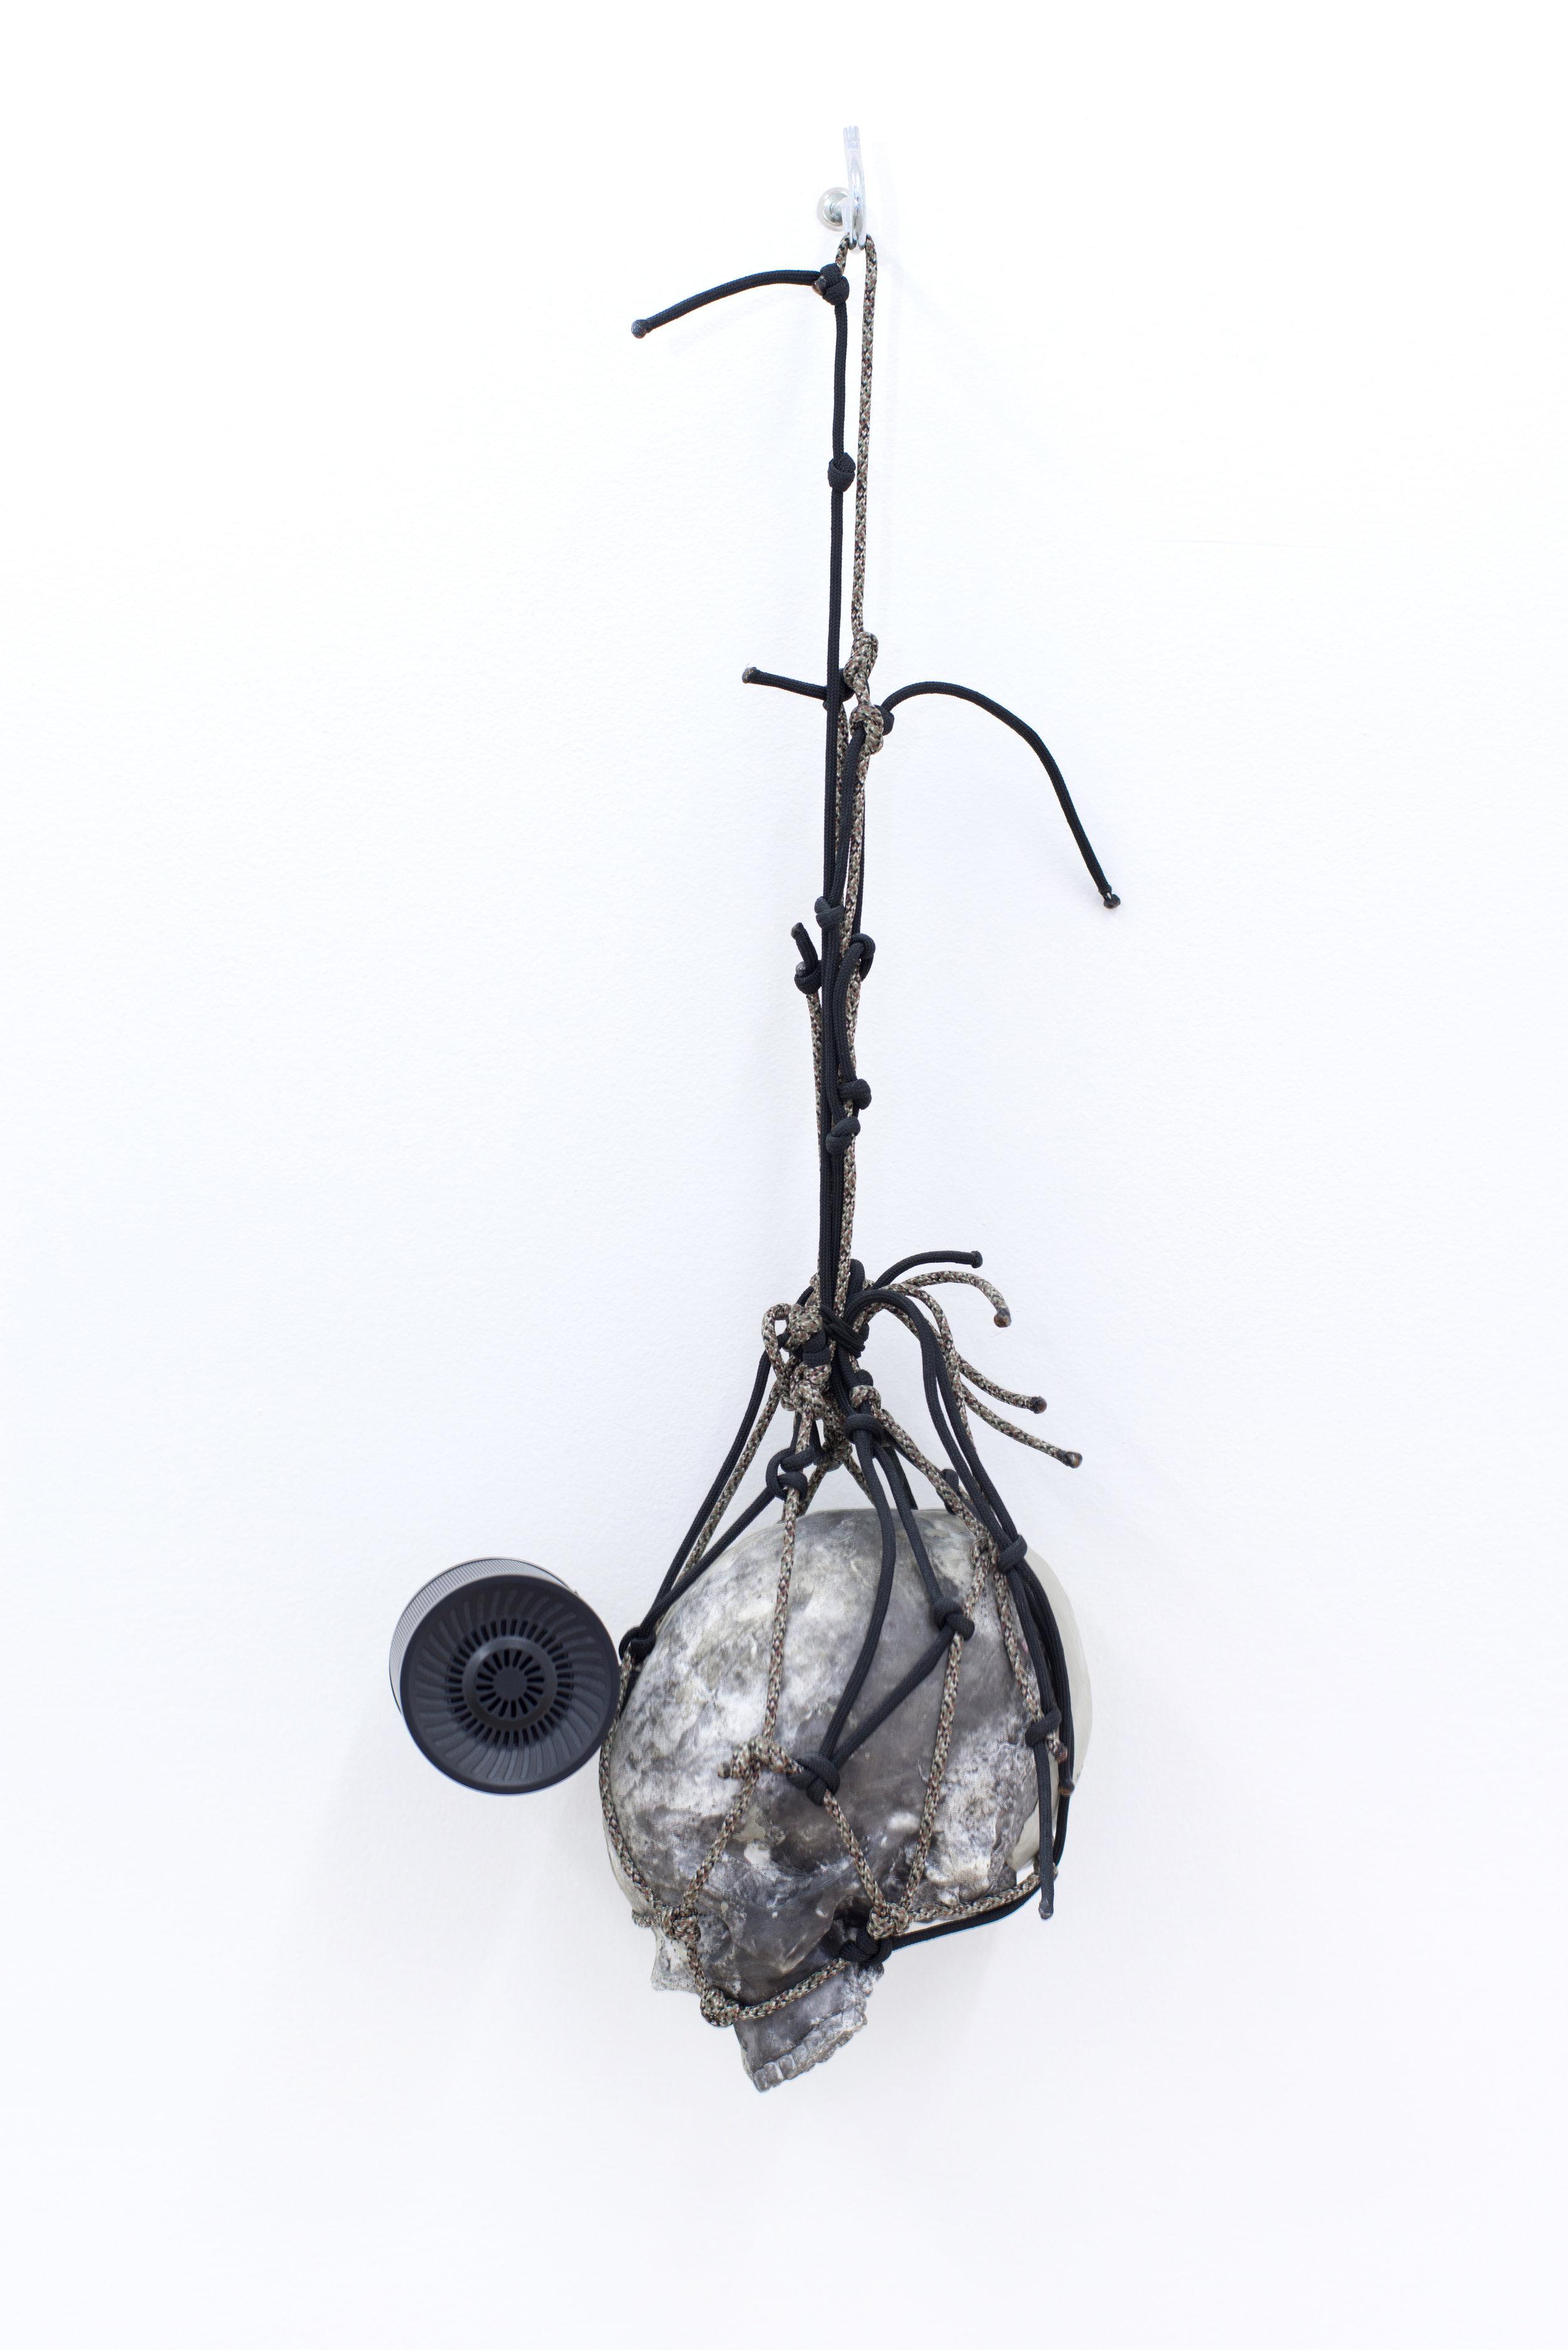 Ian Swanson   Birds, flies,  2016 Plastic, epoxy clay, carbon, USB flash drive, USB speaker, paracord, 9:48 audio loop